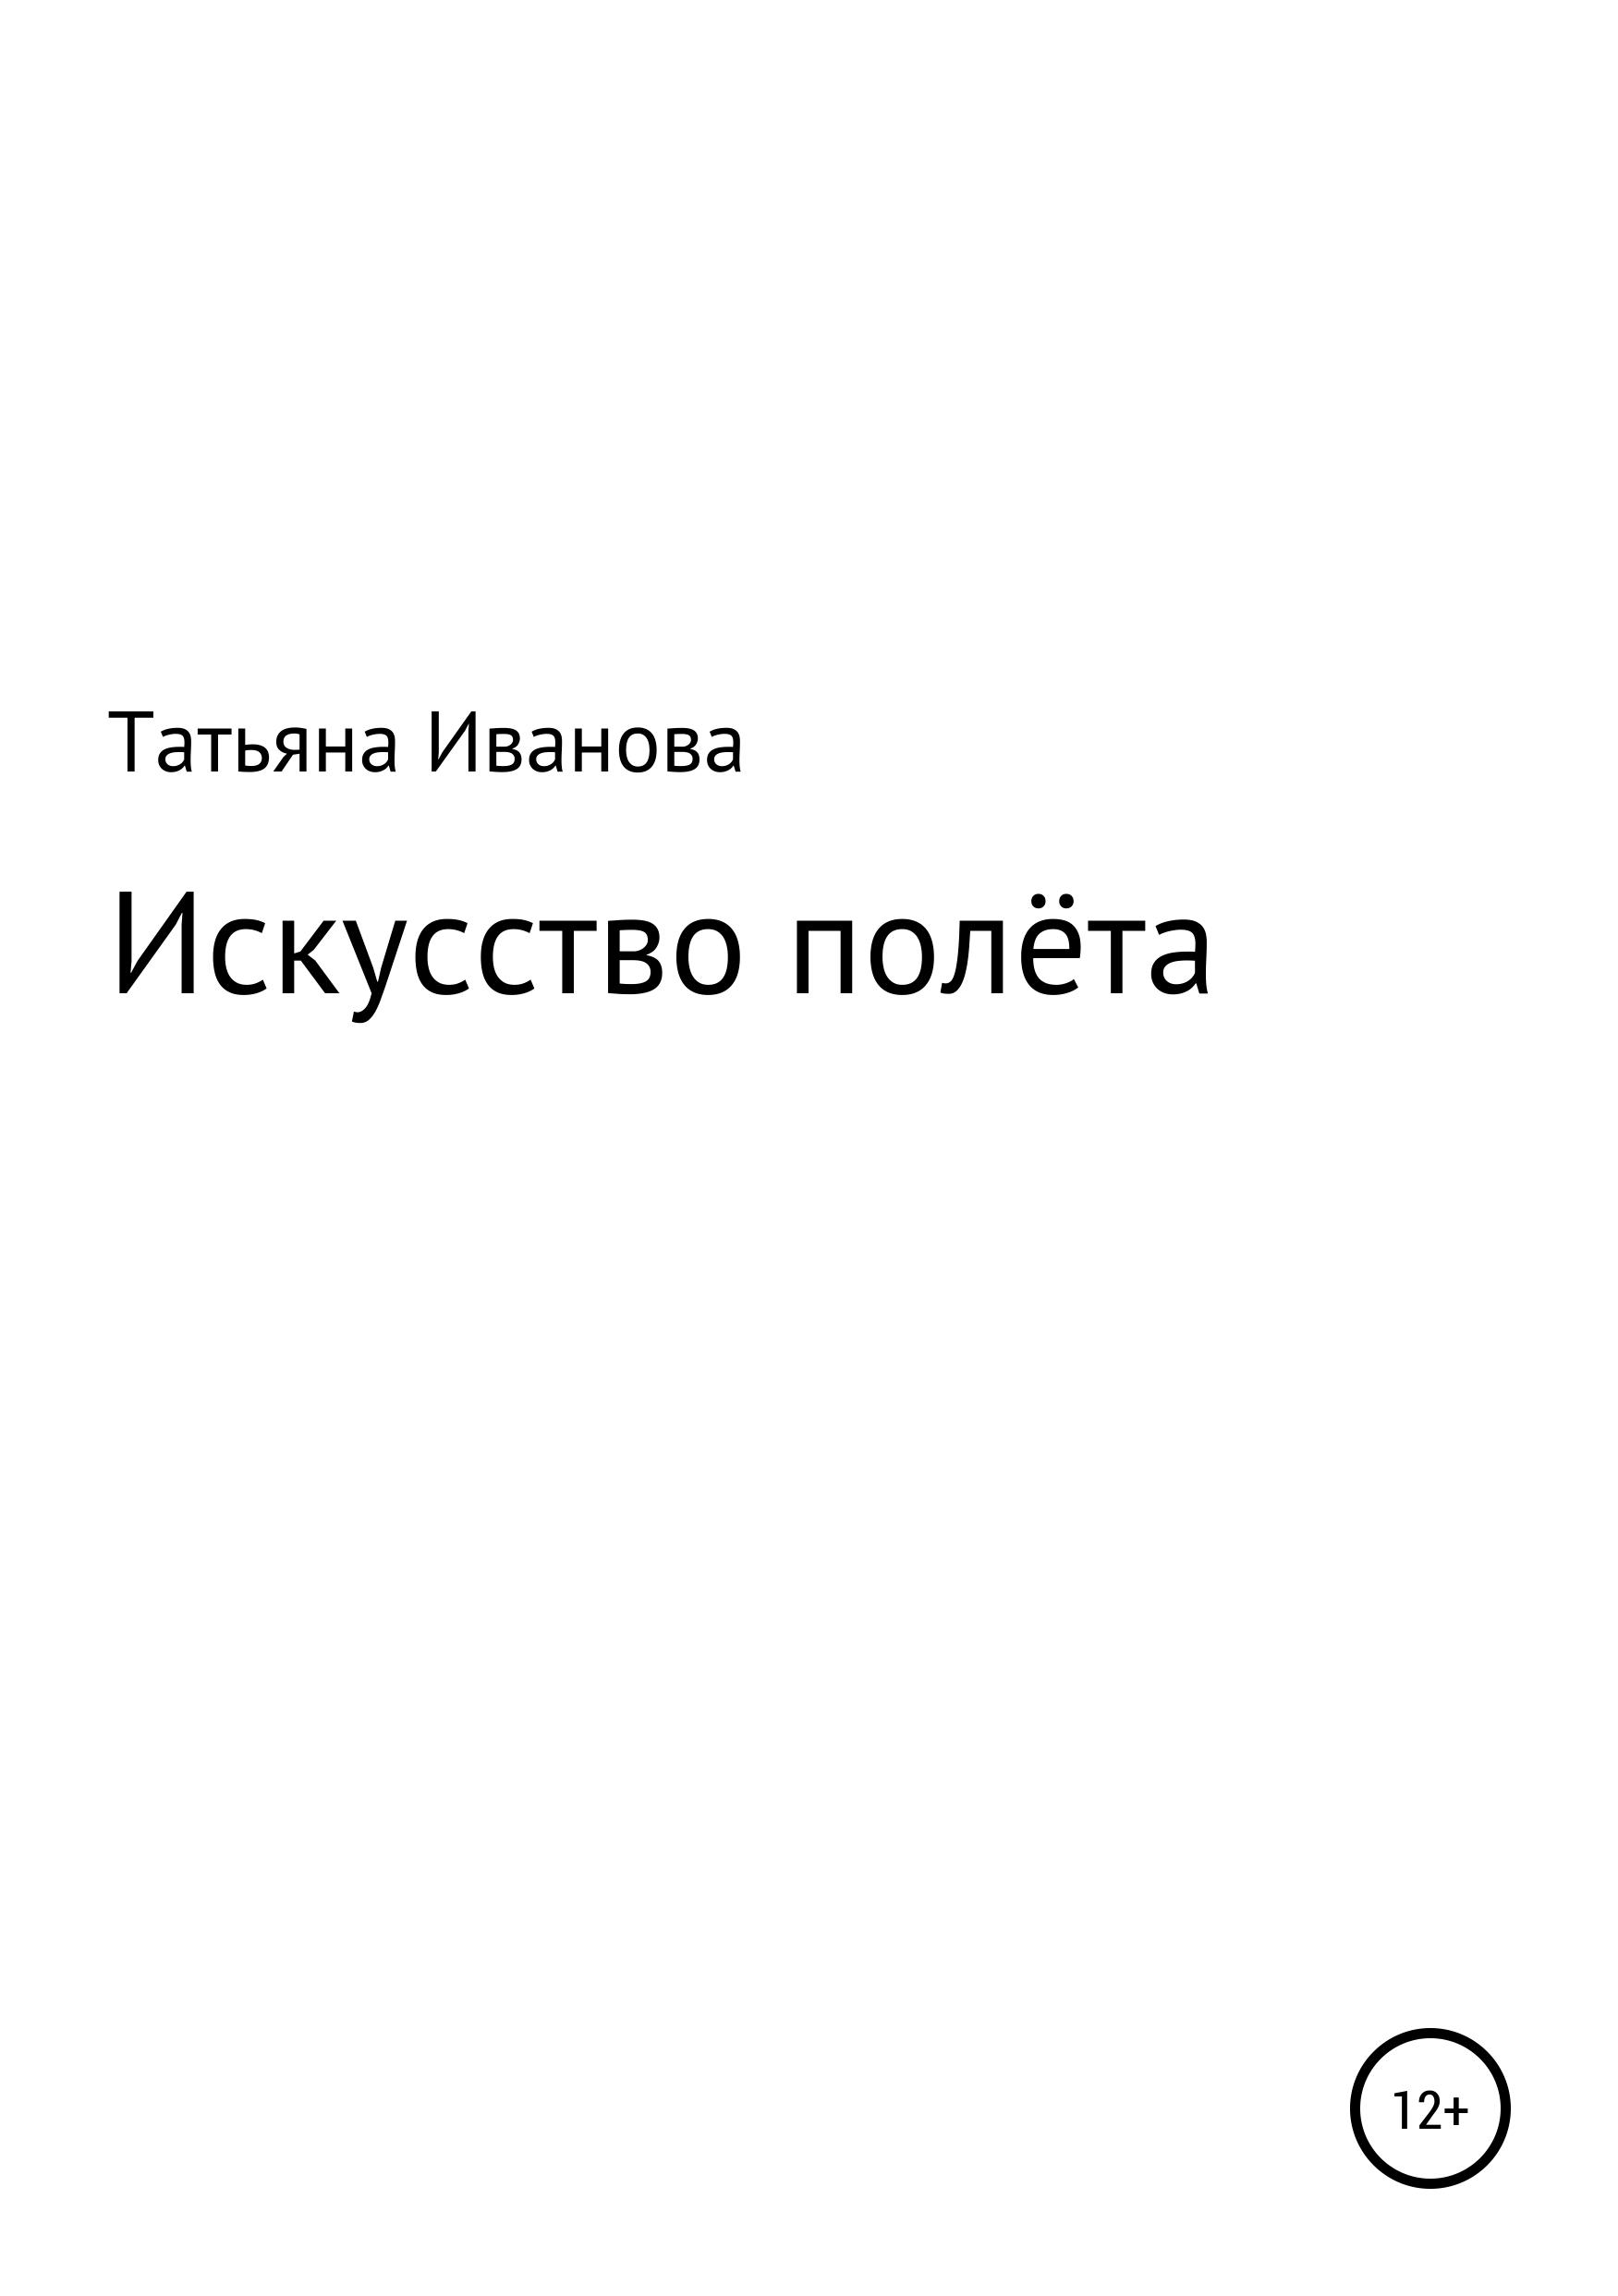 Татьяна Александровна Иванова Искусство полёта татьяна александровна иванова искусство полёта